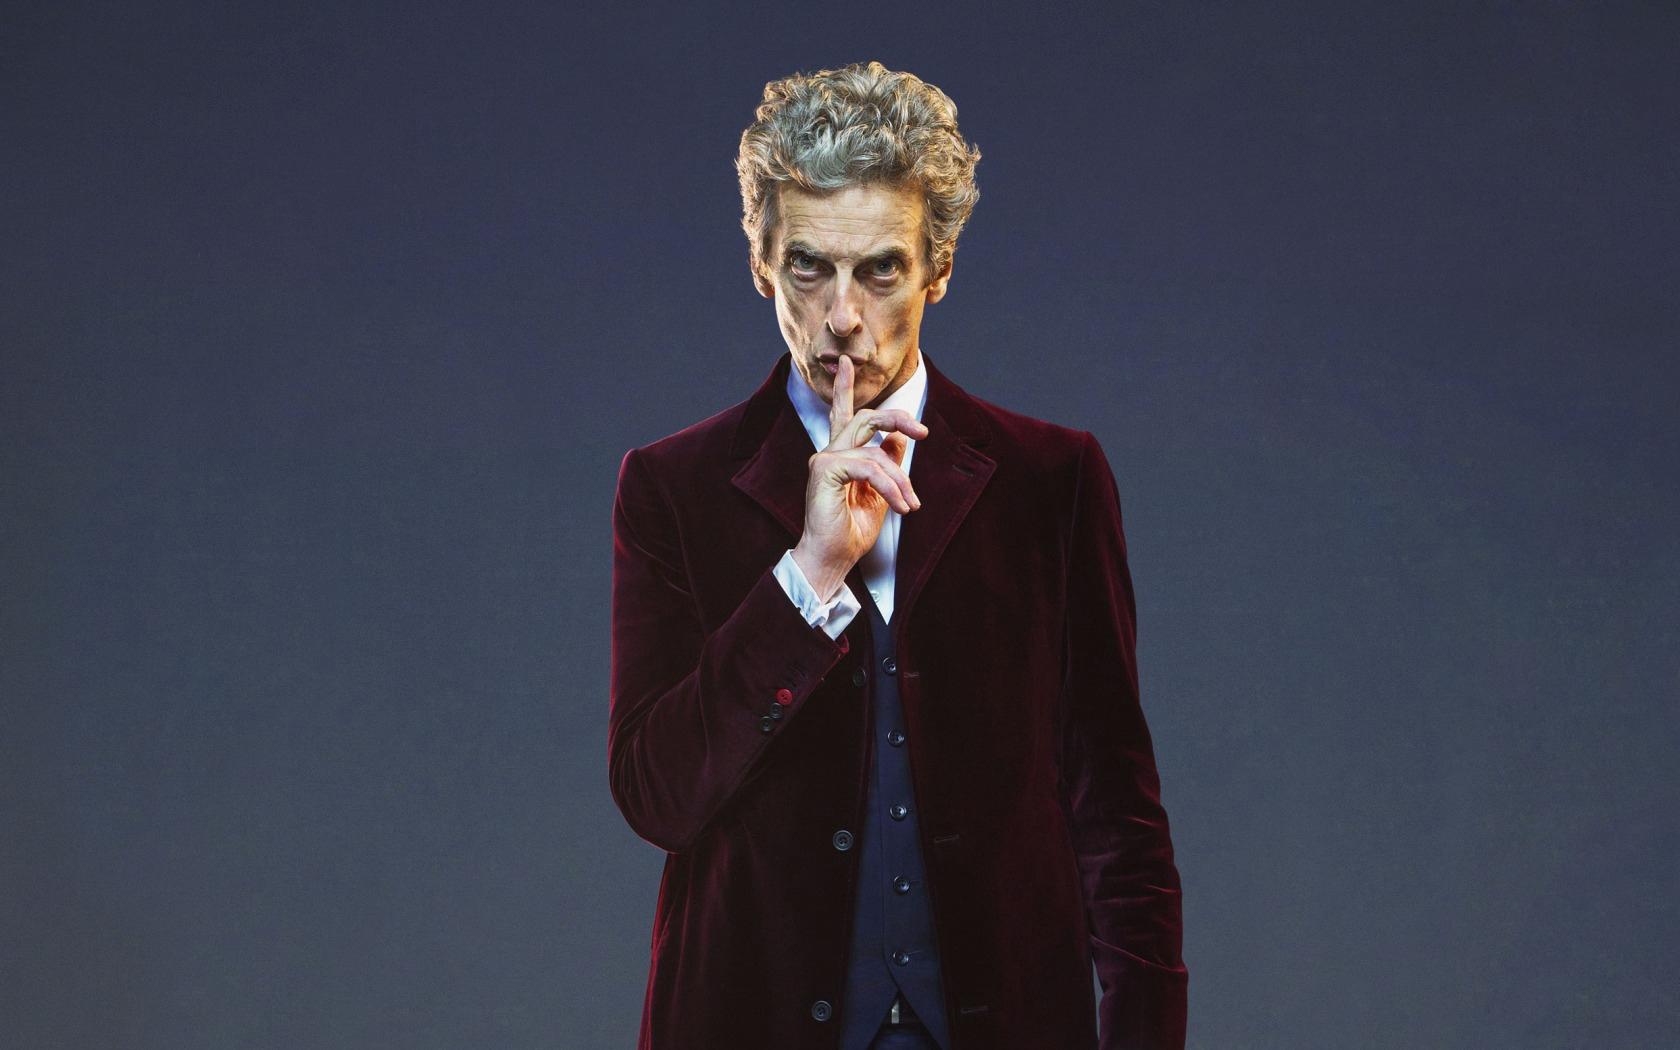 Doctor Who Twelfth Doctor Peter Capaldi   Stock Photos 1680x1050